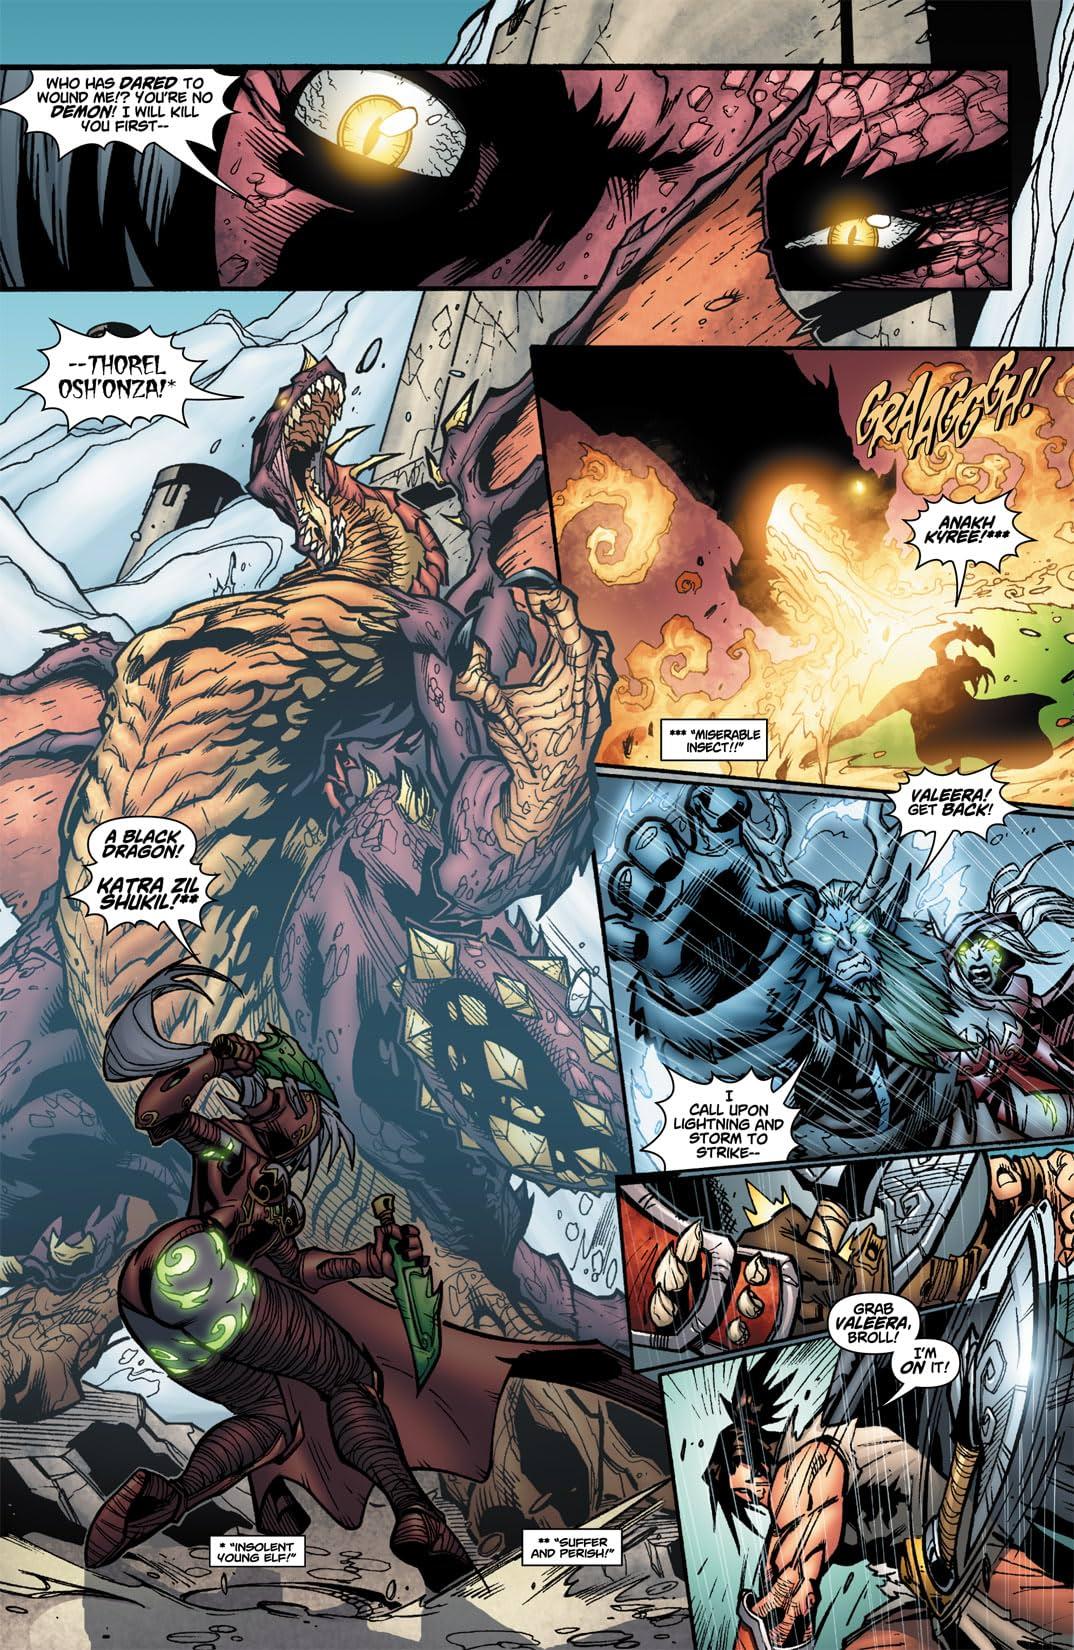 World of Warcraft #11